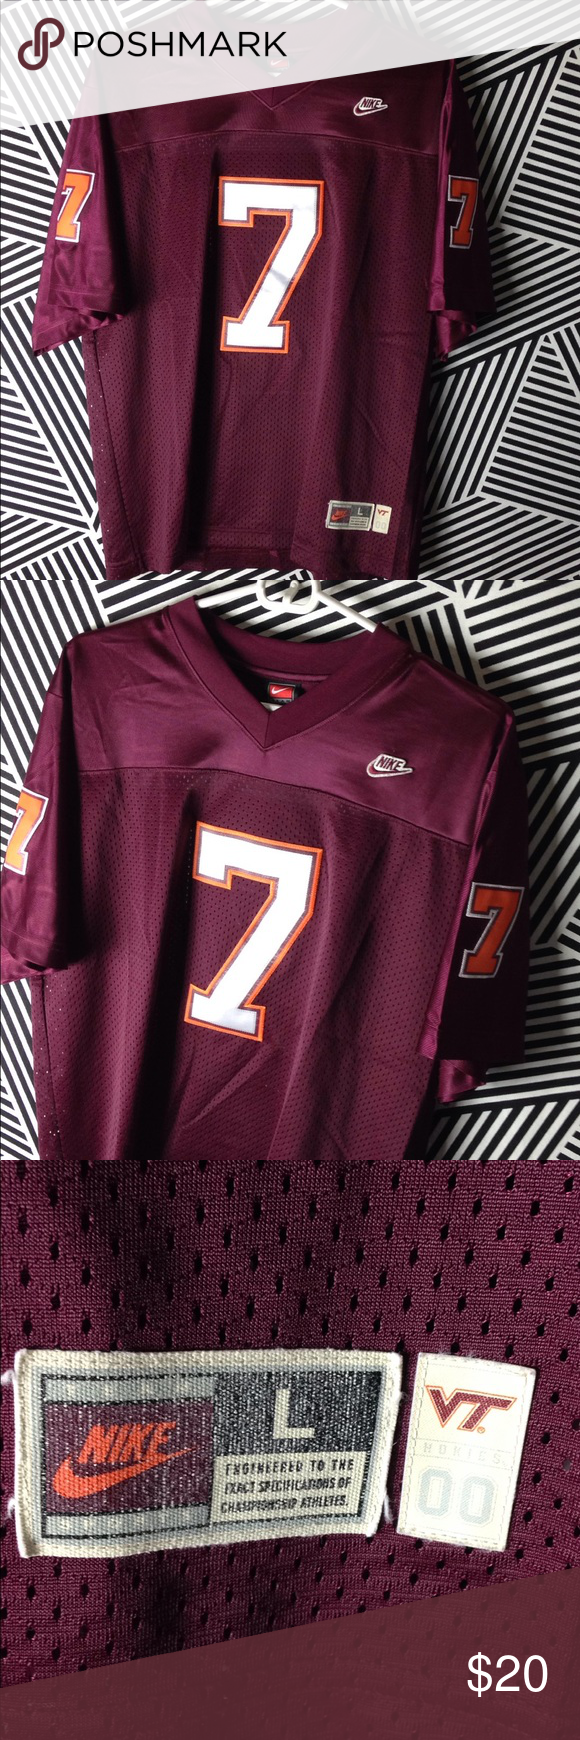 Nike Virginia Tech Hokies college football jersey Size